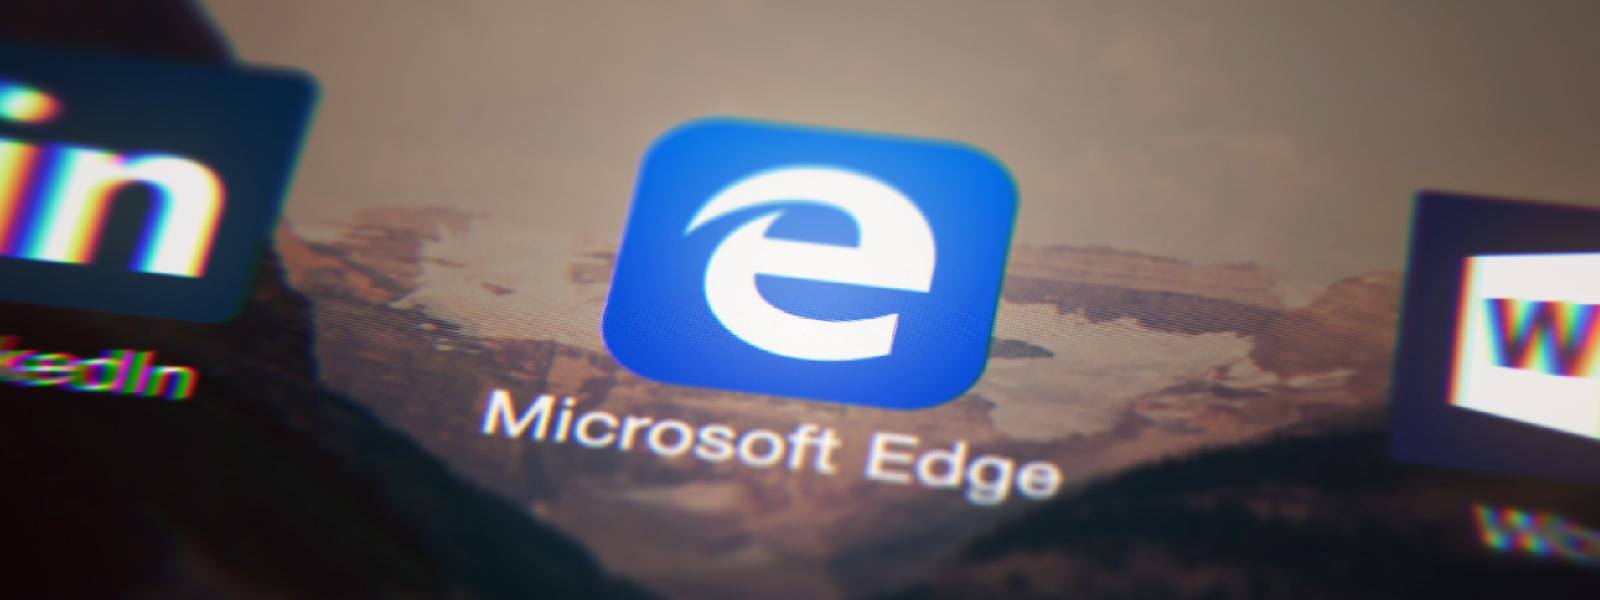 A transparent Microsoft Edge app tile